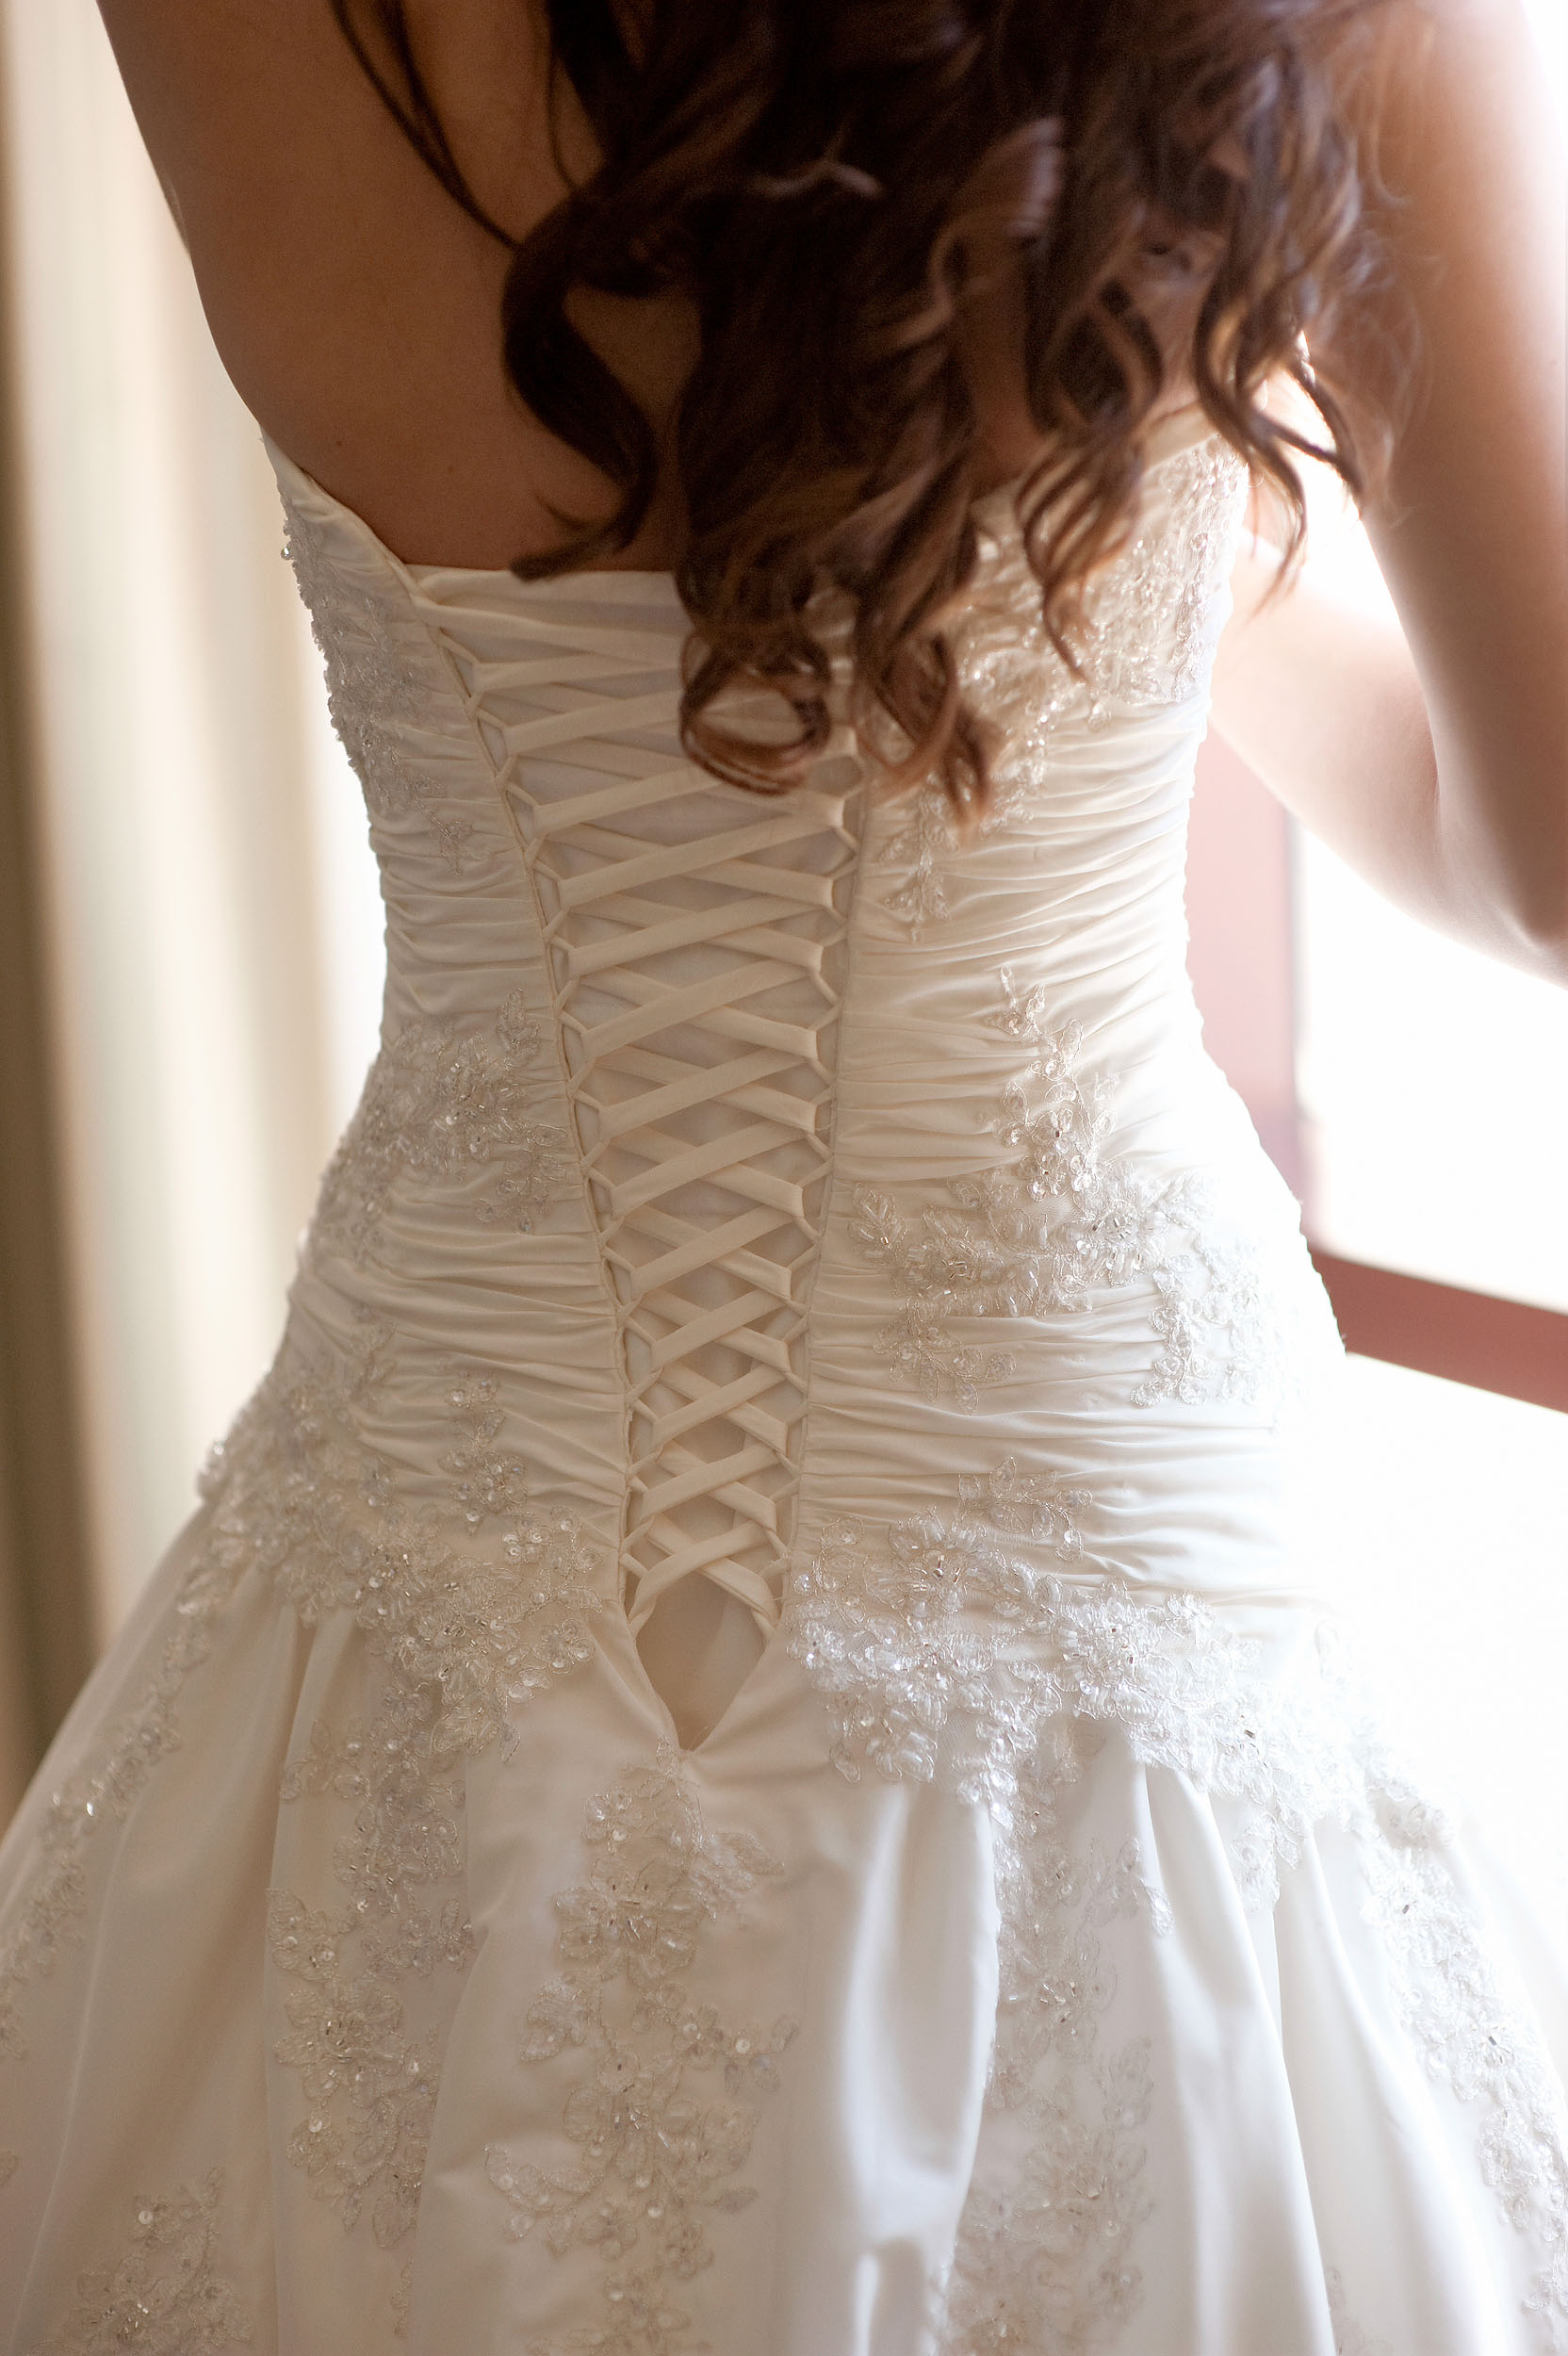 Lacing on back of bride's wedding dress at Pechanga Resort & Casino in Temecula.